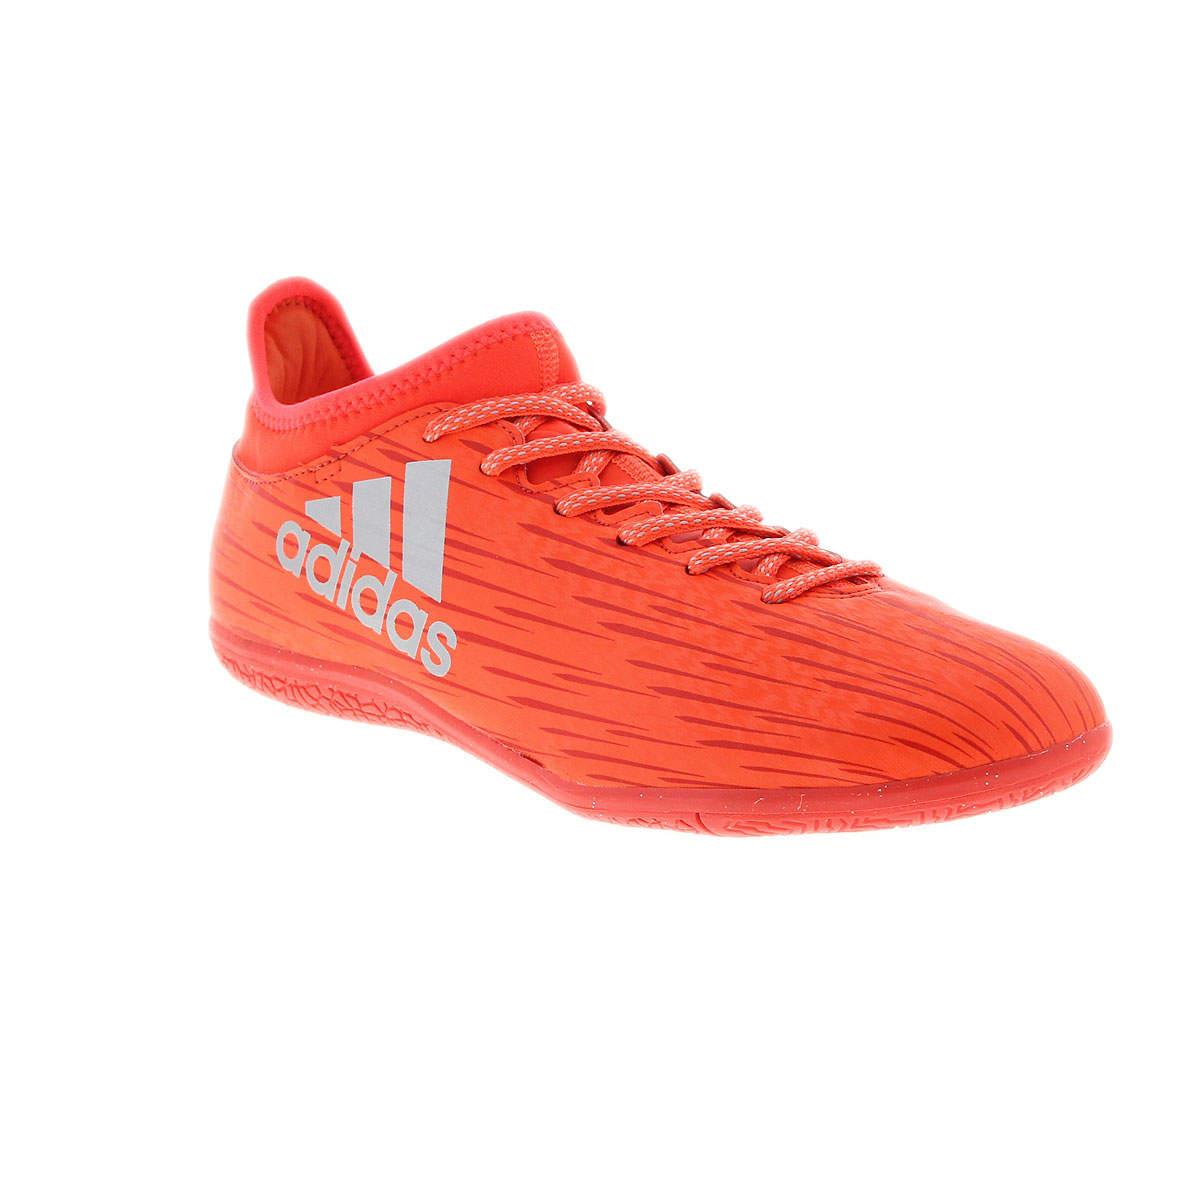 Tênis Adidas X 16.3 Futsal